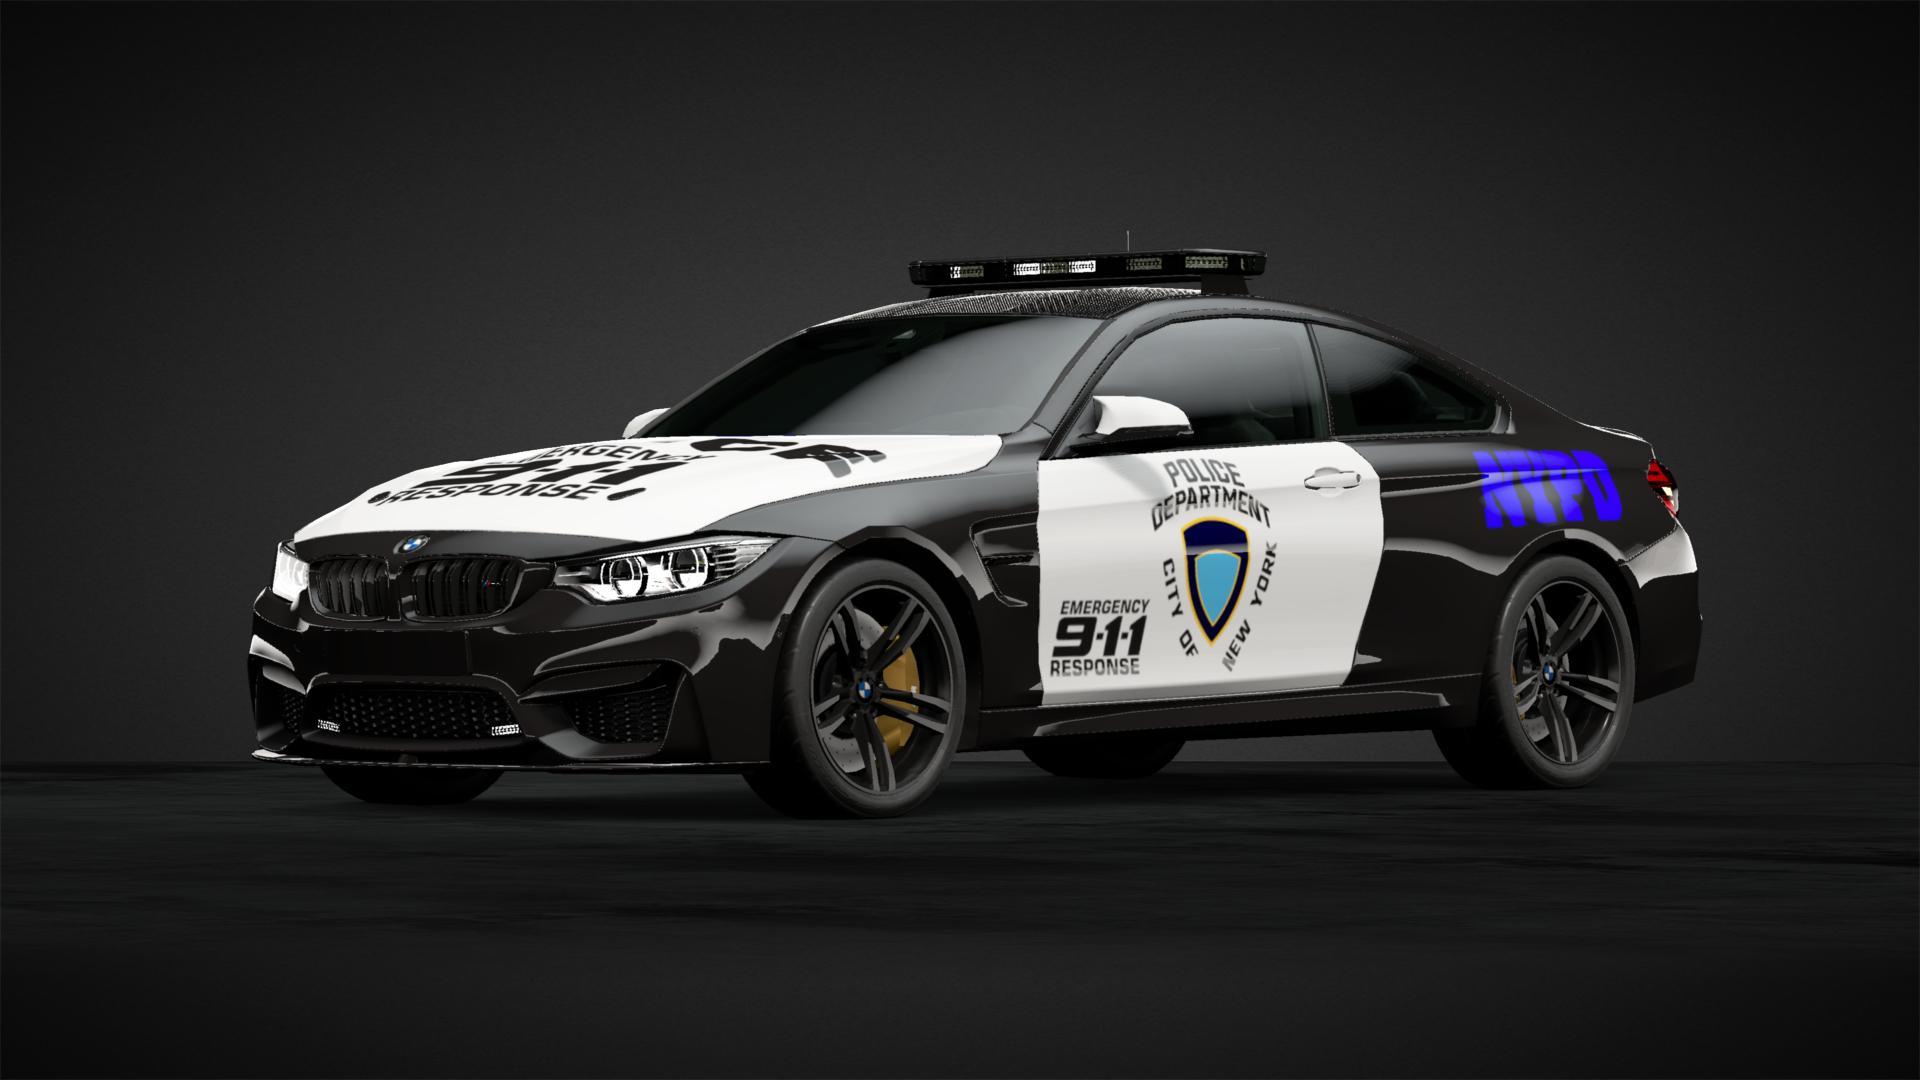 Bmw M4 Police Car